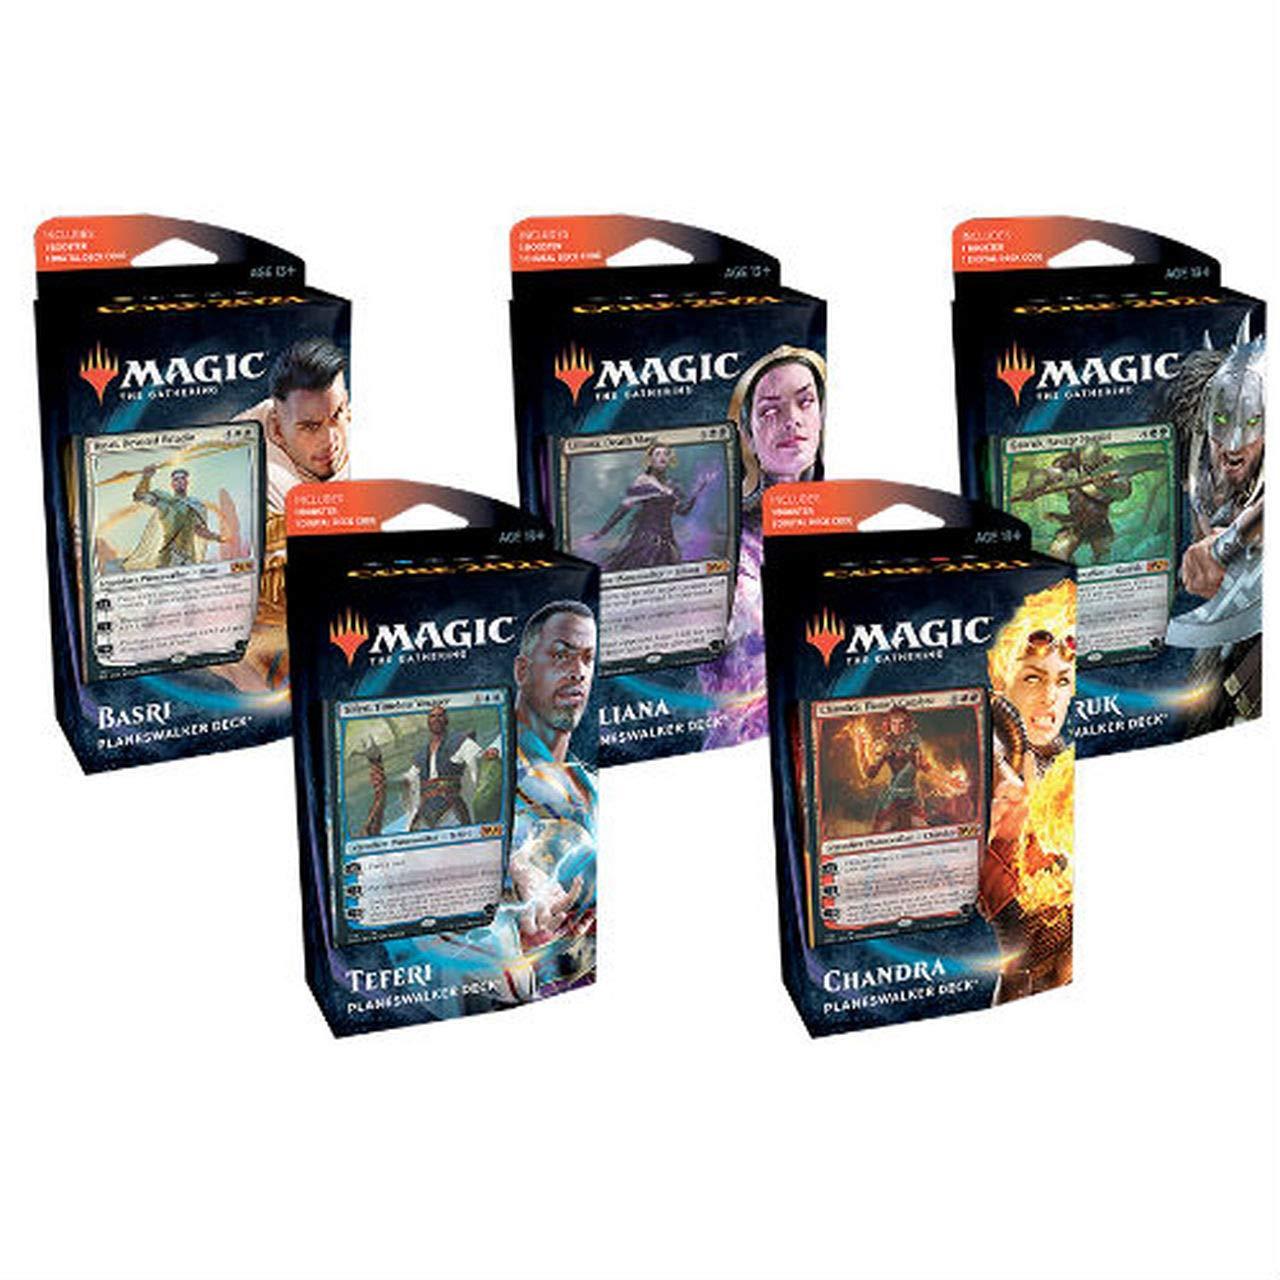 MTG Magic the Gathering Core Set 2021 M21 - All 5 Planeswalker Decks!